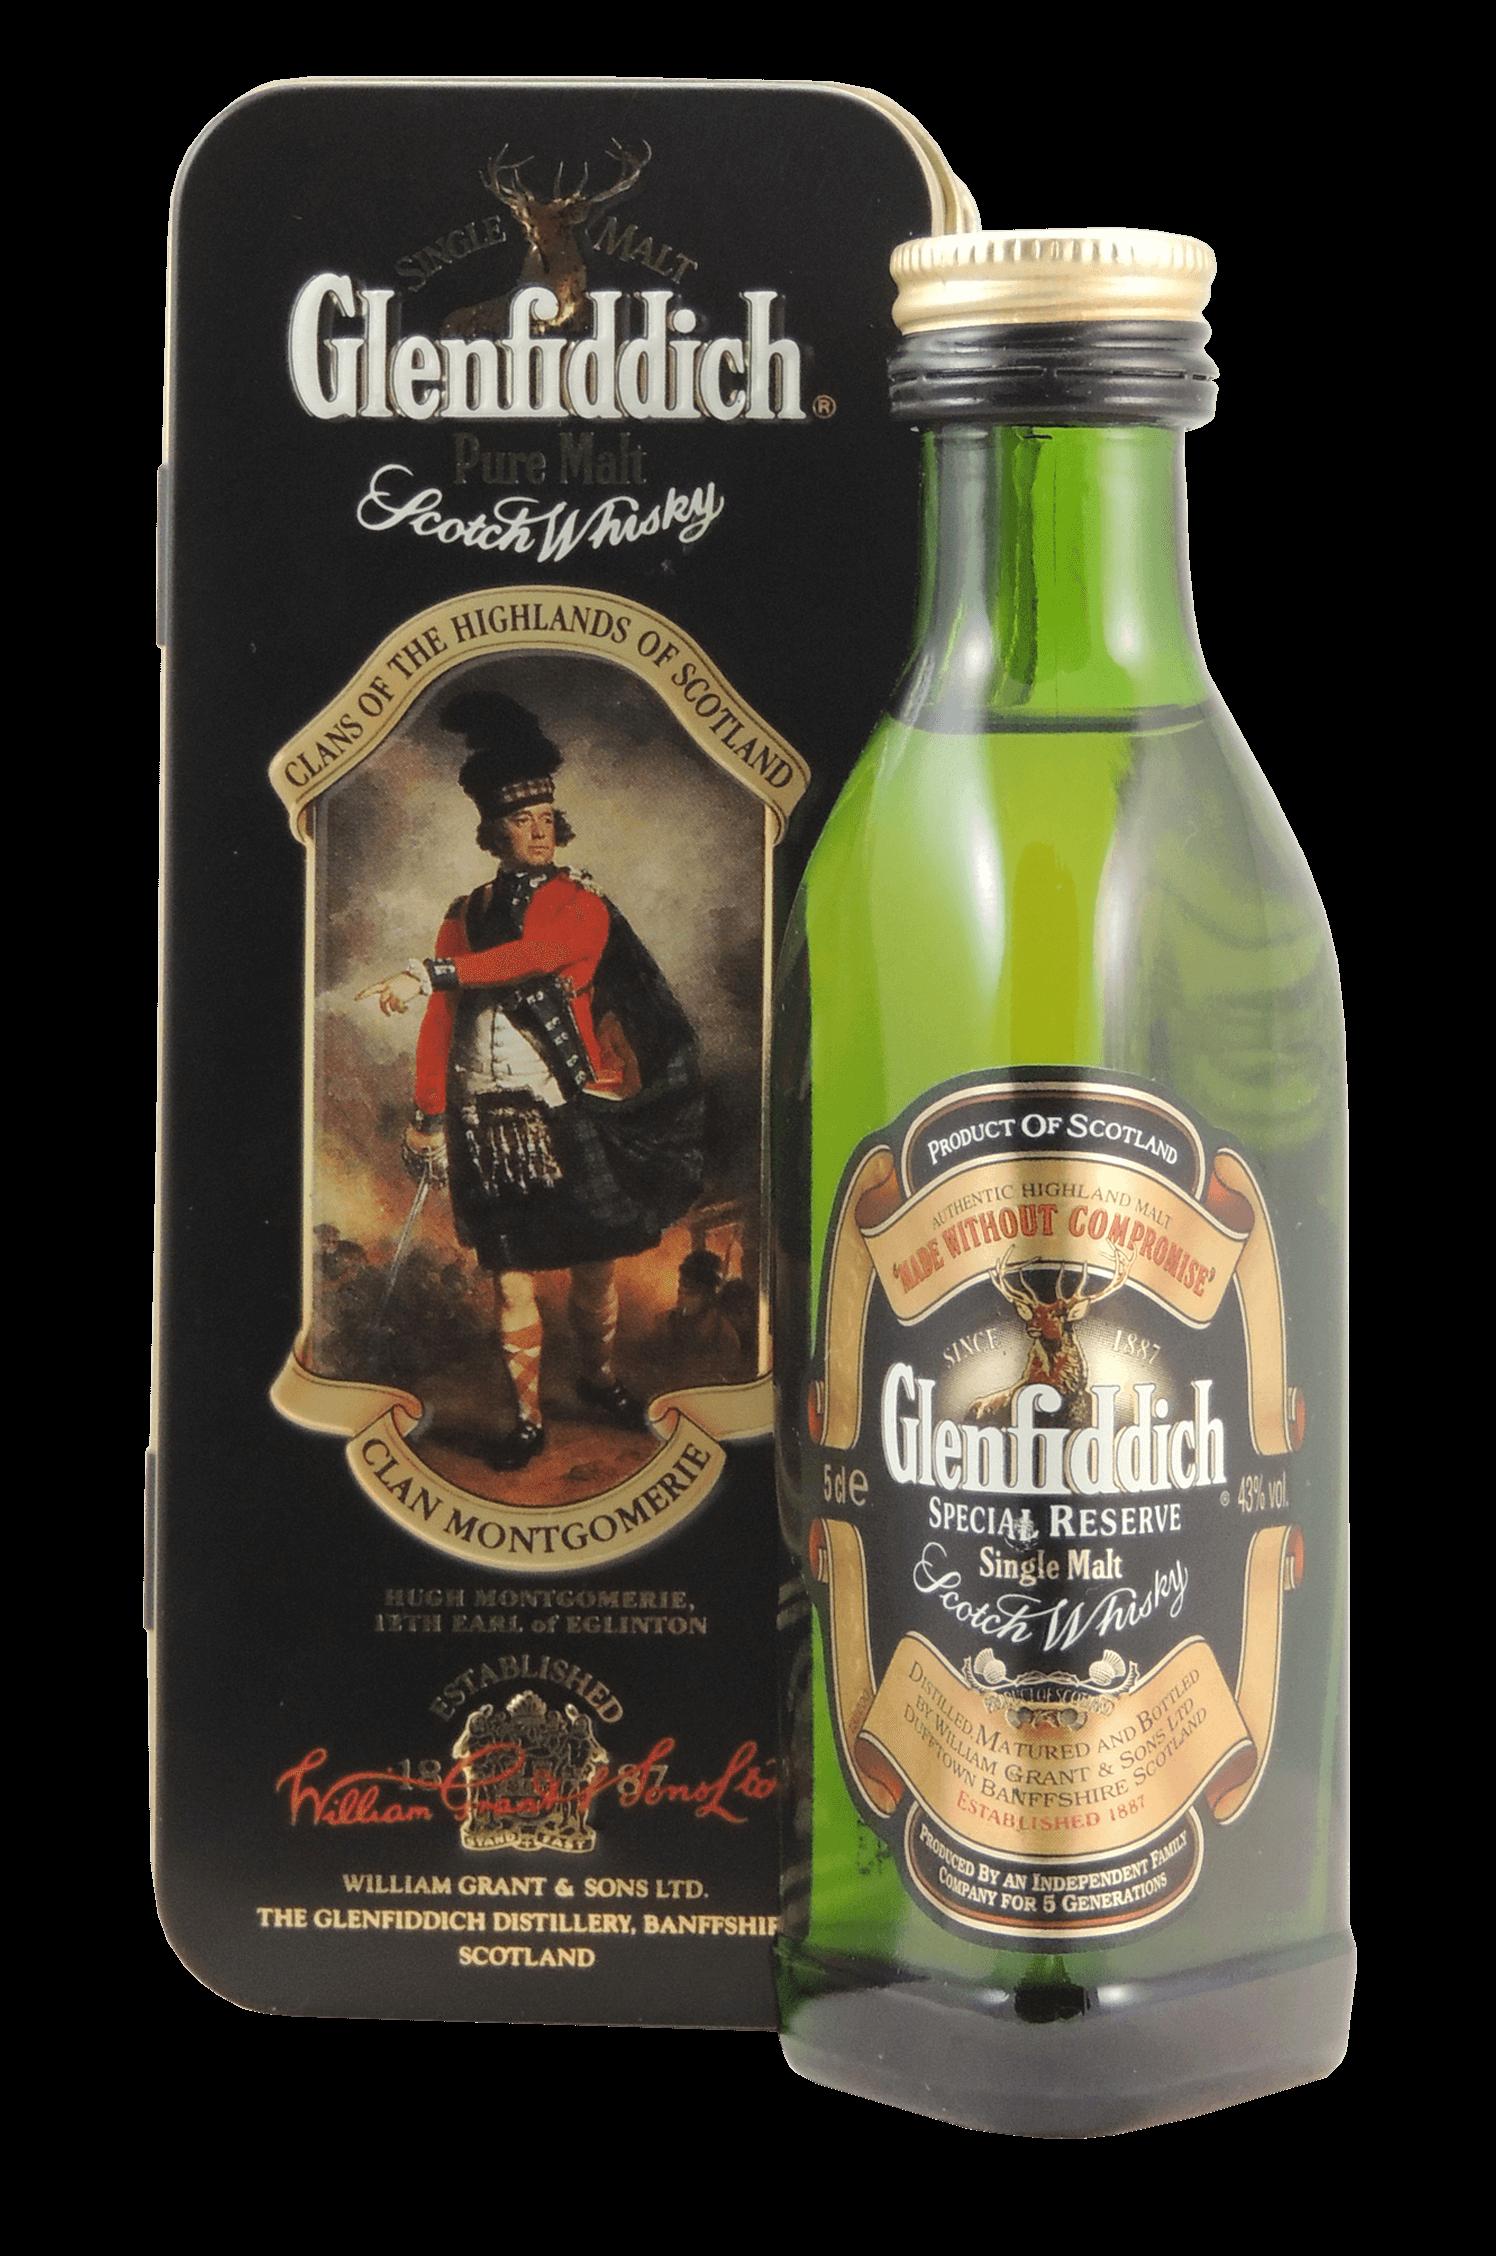 Glenfiddich Pure Malt Scotch Whisky